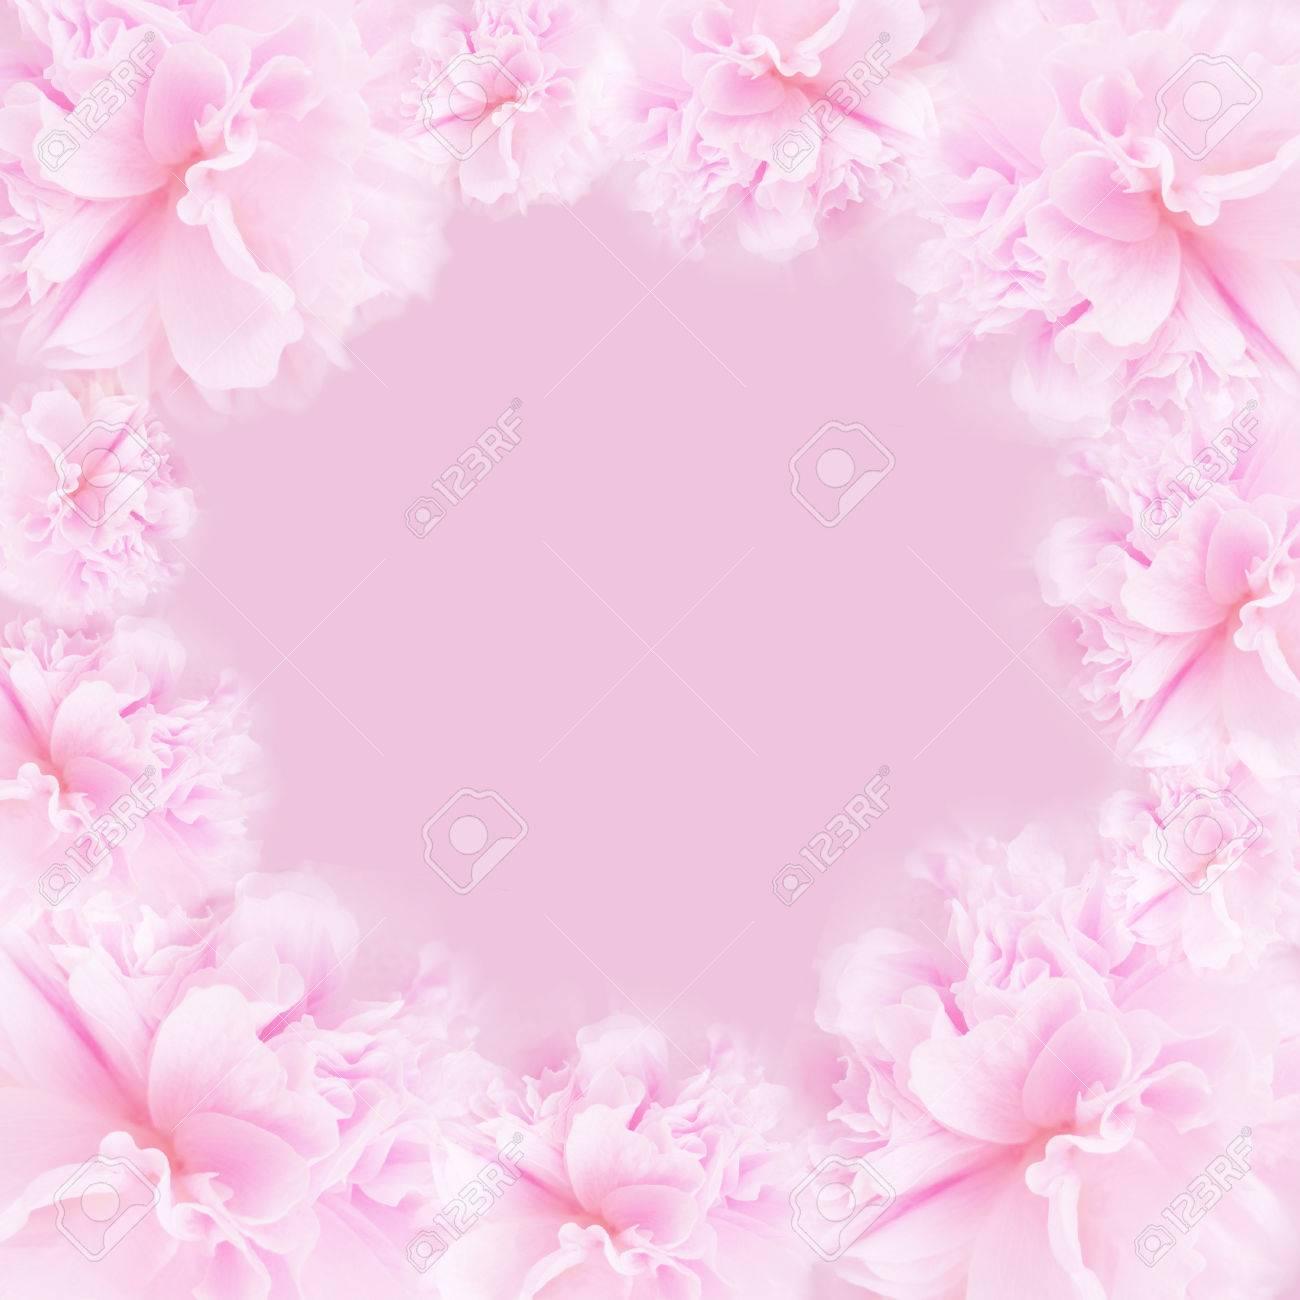 Pink flower on soft pastel color in blur style. Blossom - pink flower, floral background. Pink background. - 75527843